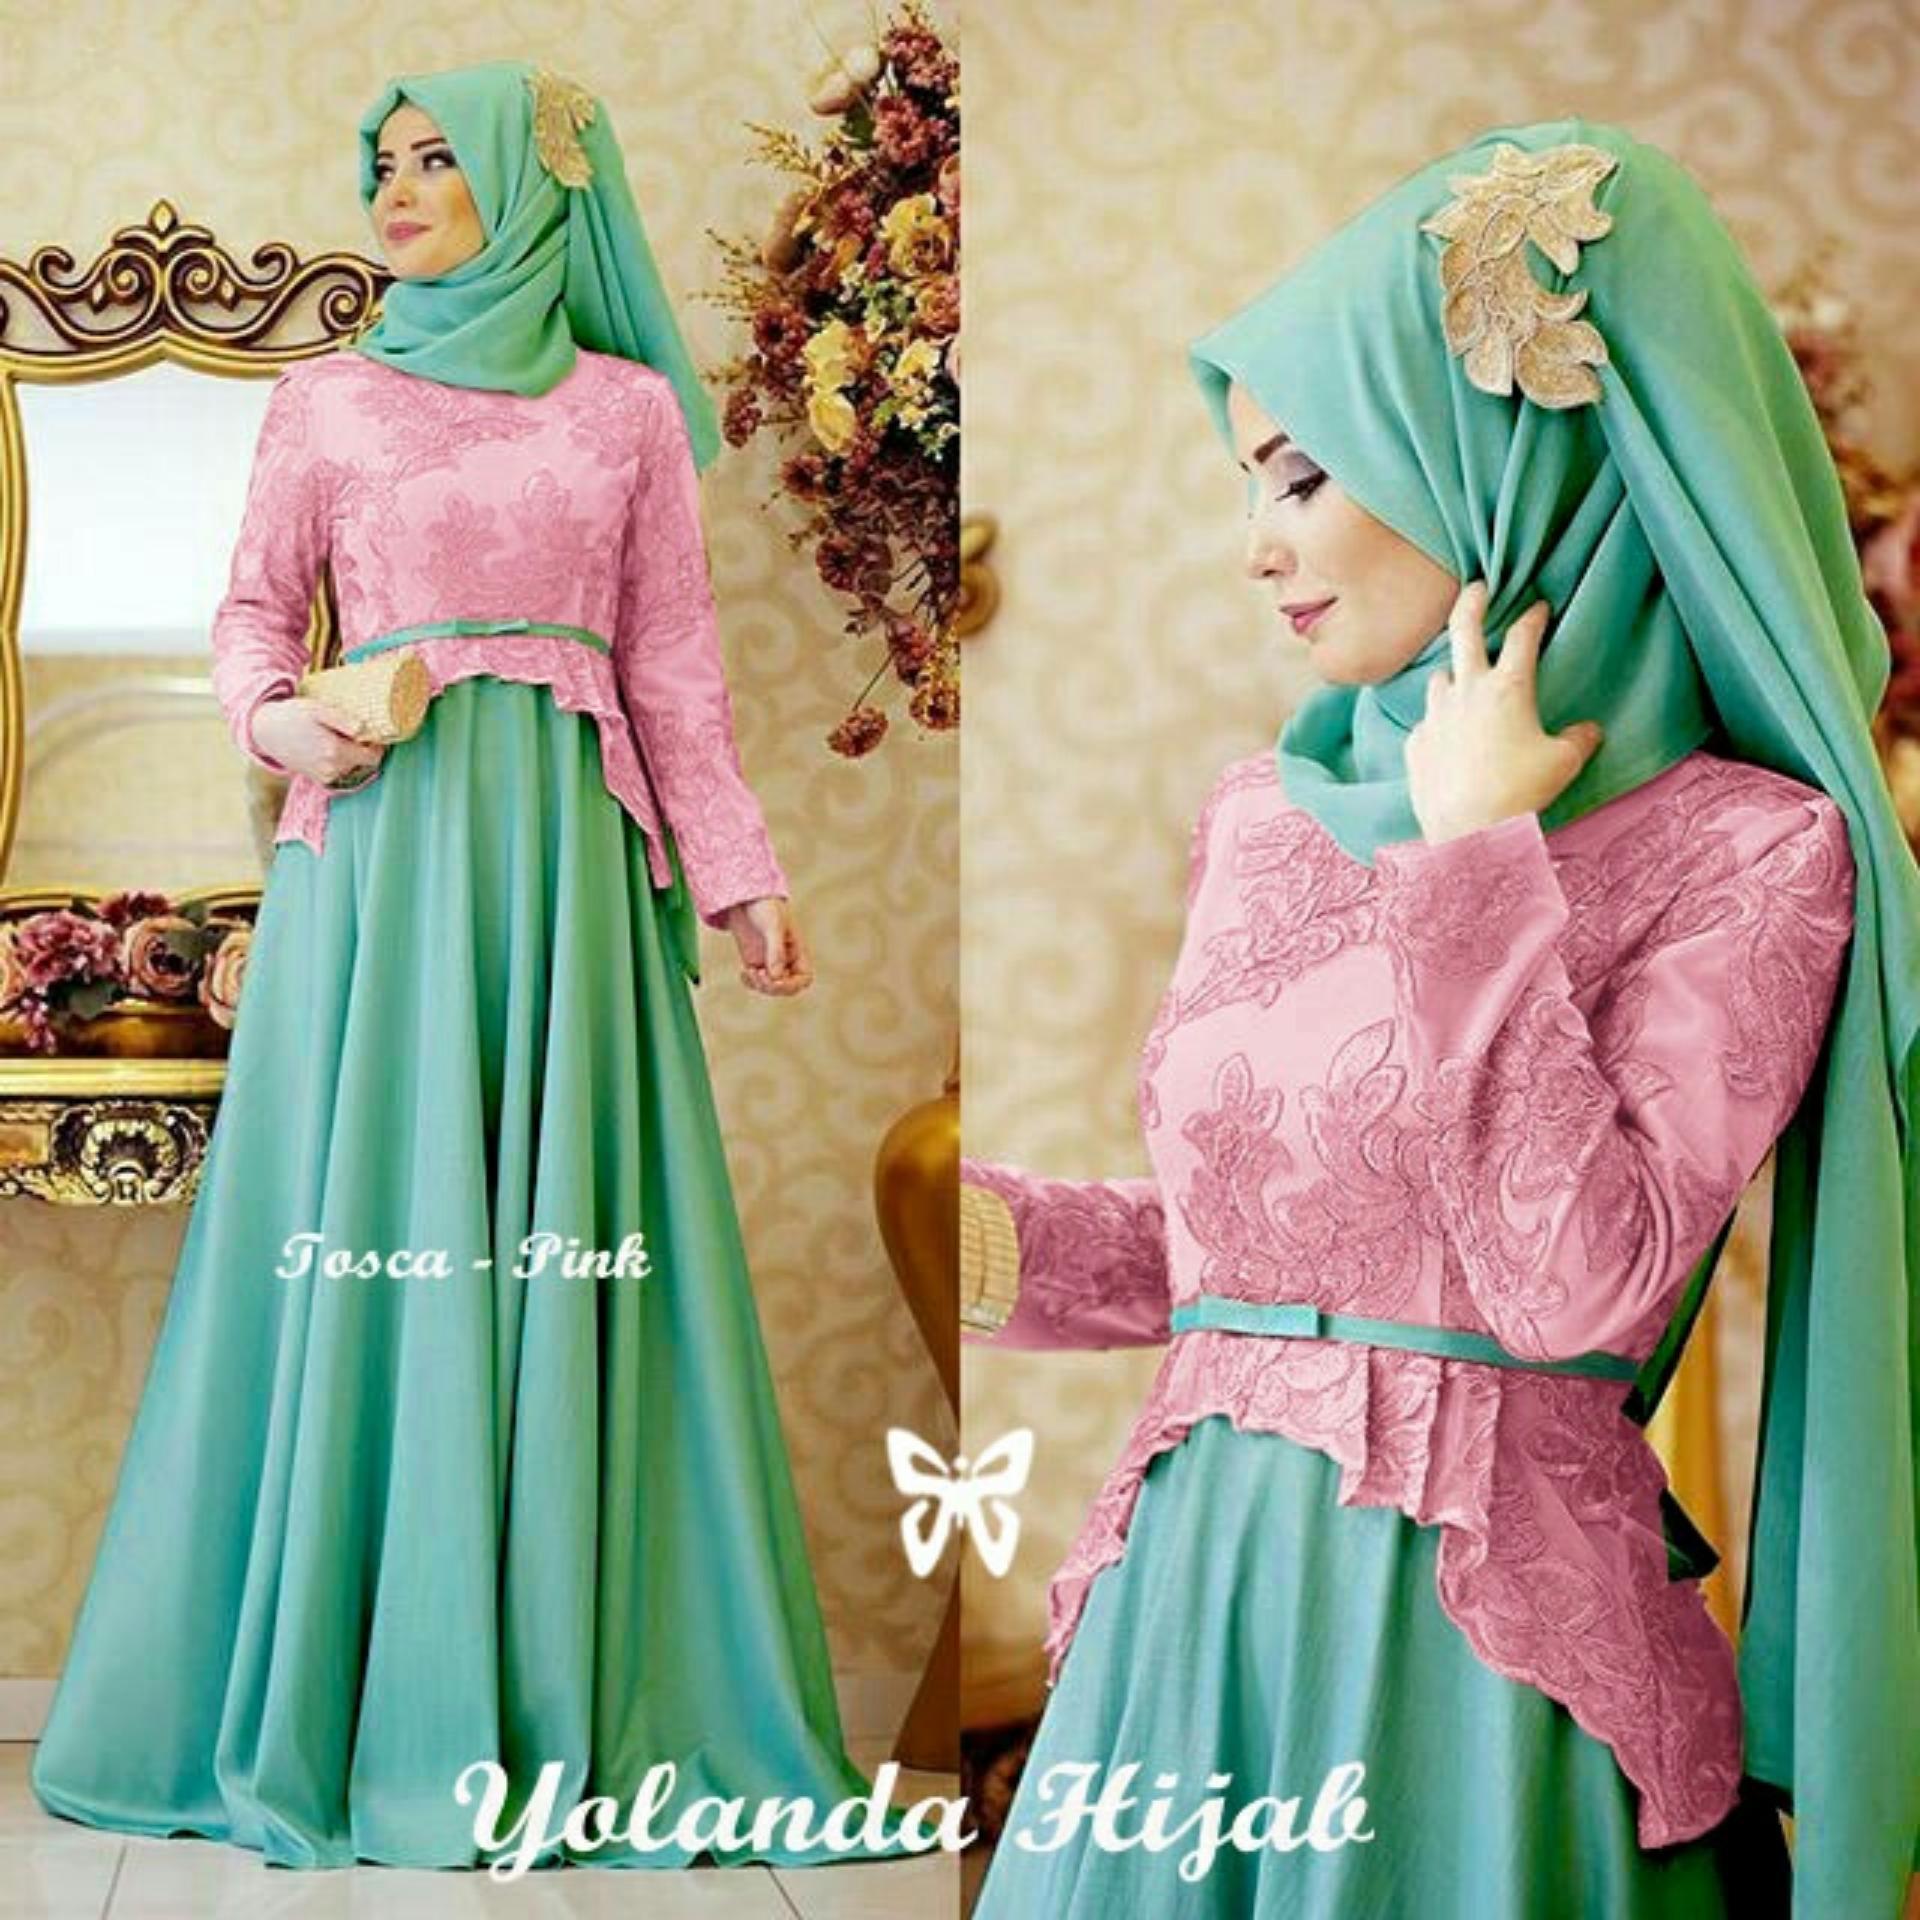 Baju Wanita Shop [Best Seller] Dress Gamis Muslim Amirah / Hijab Muslim / Muslim Syari Syar'i Hijab  / Busana Muslimahah Wanita / Kebaya Modern (landayo) SS - Pink Tosca / Gaun Pesta